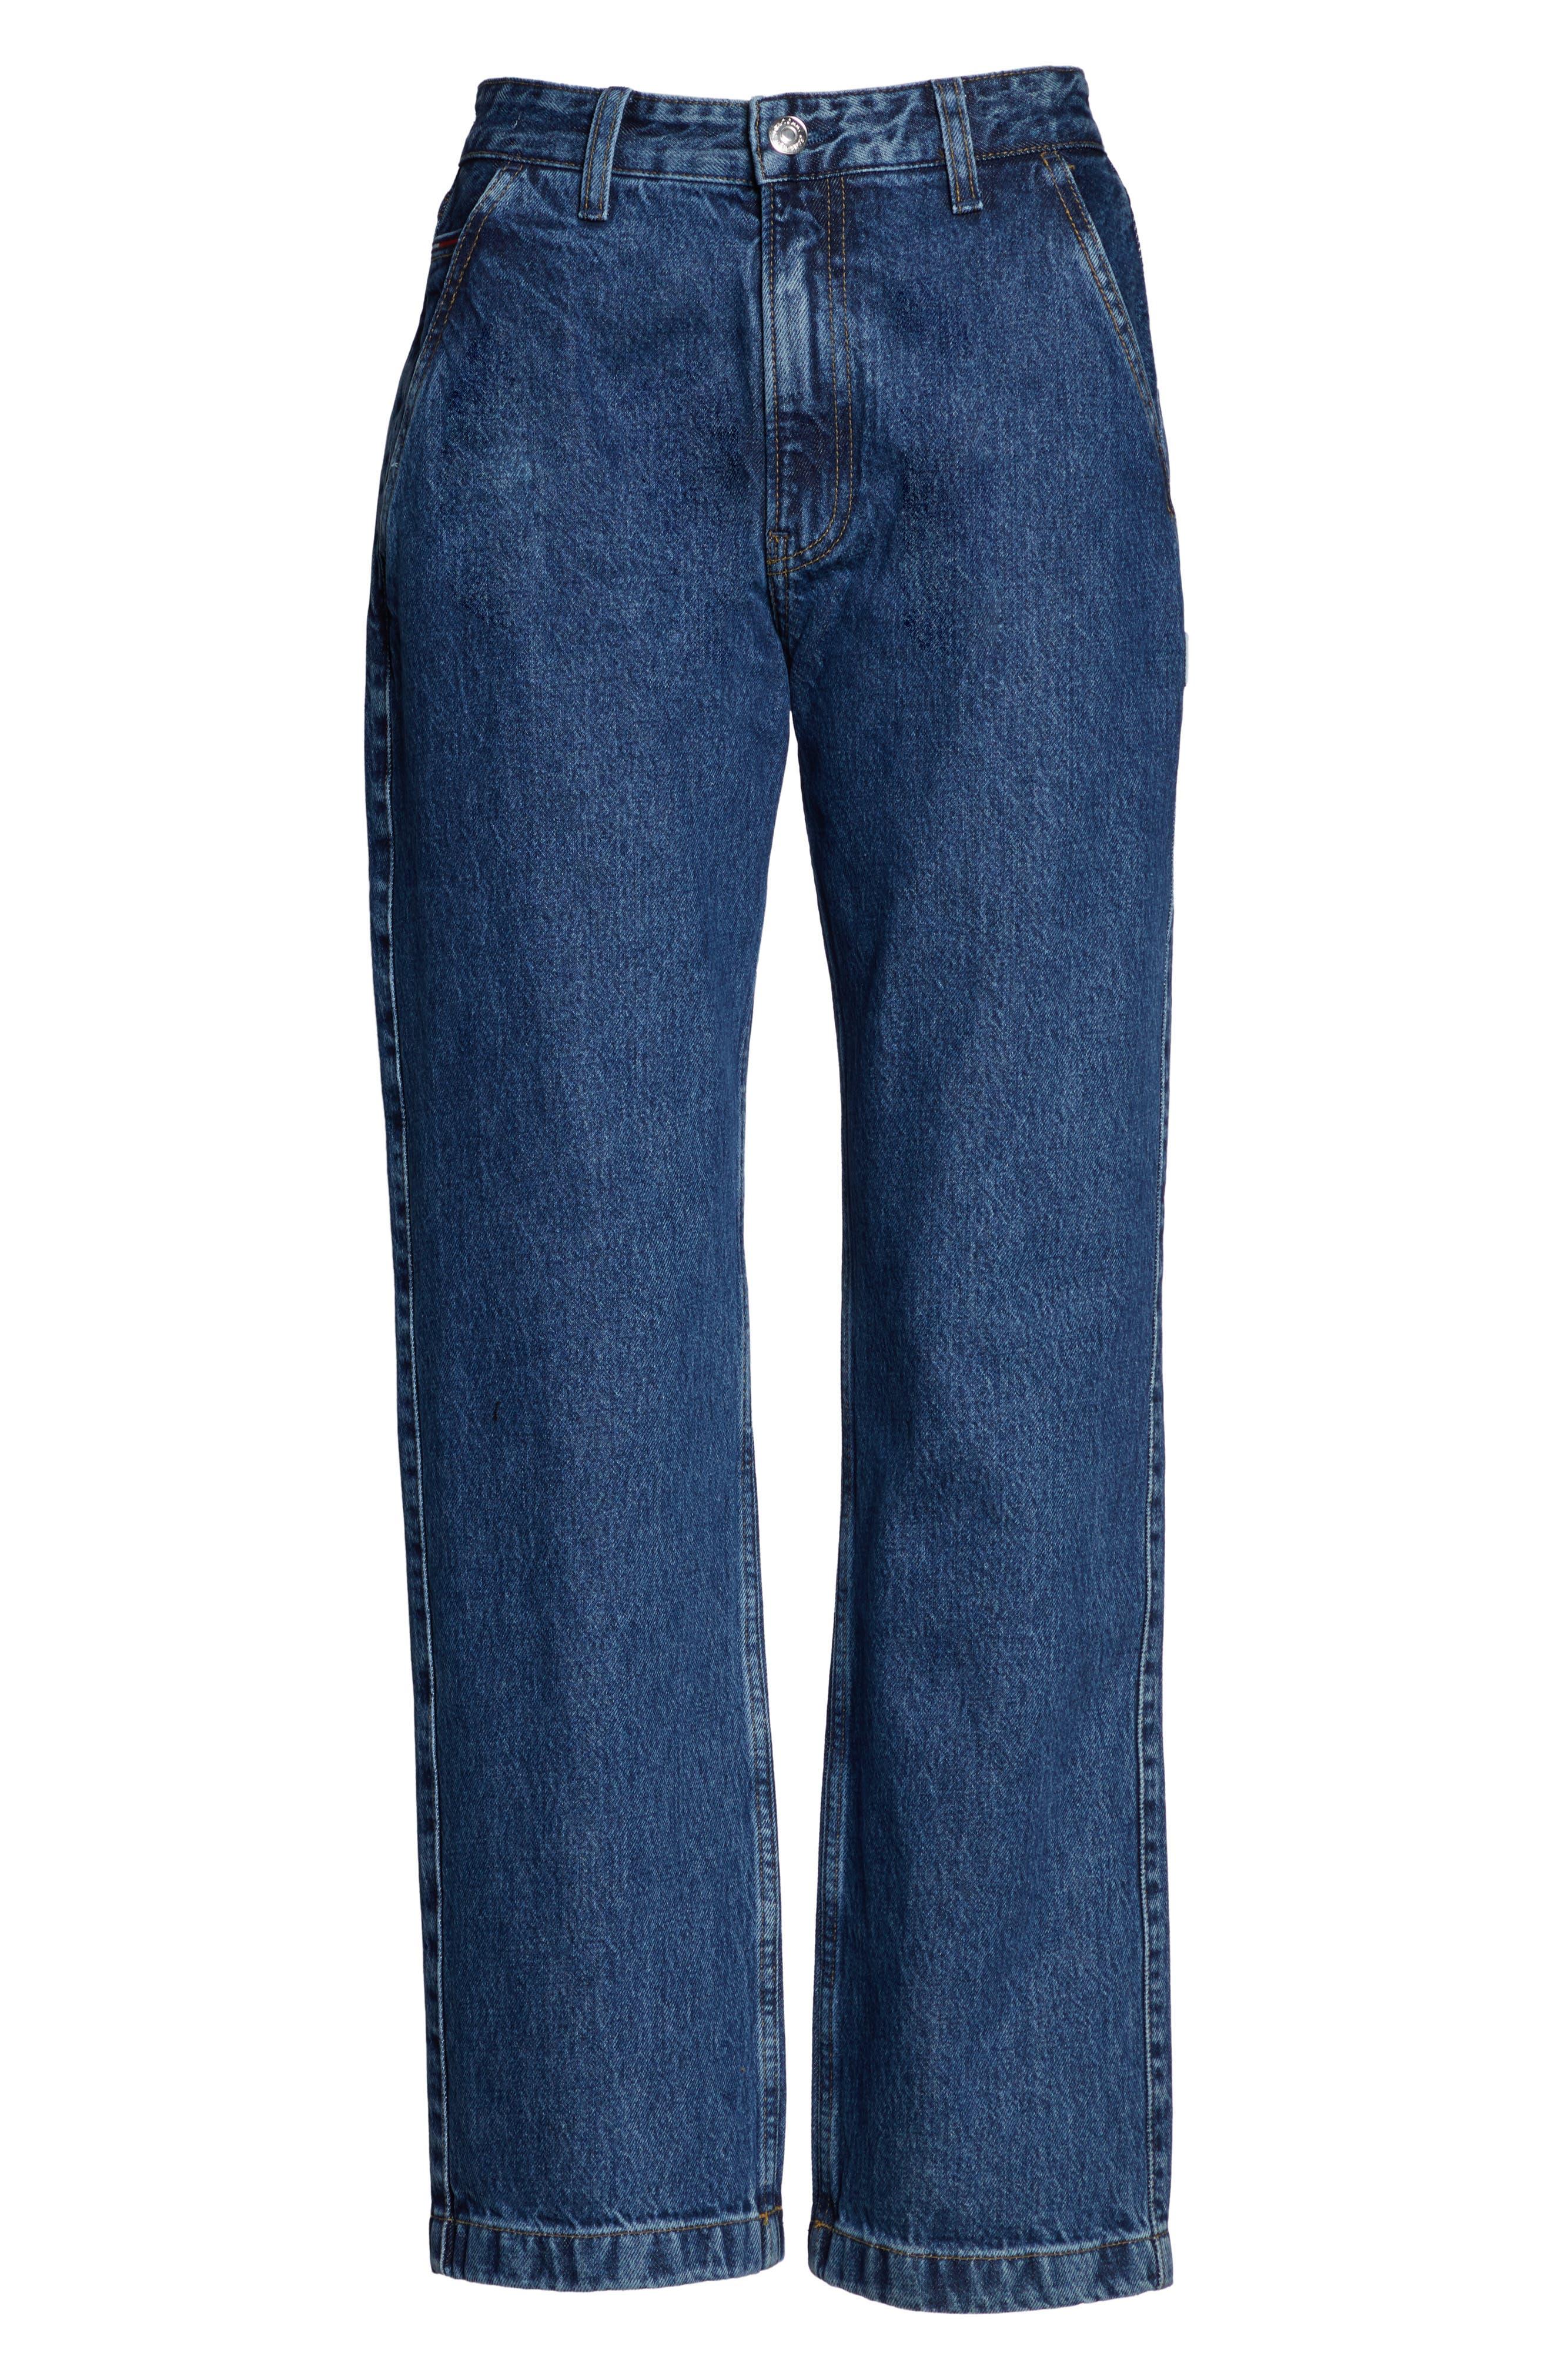 TJW Straight Leg Jeans,                             Alternate thumbnail 5, color,                             GOUGH MID BLUE RIGID